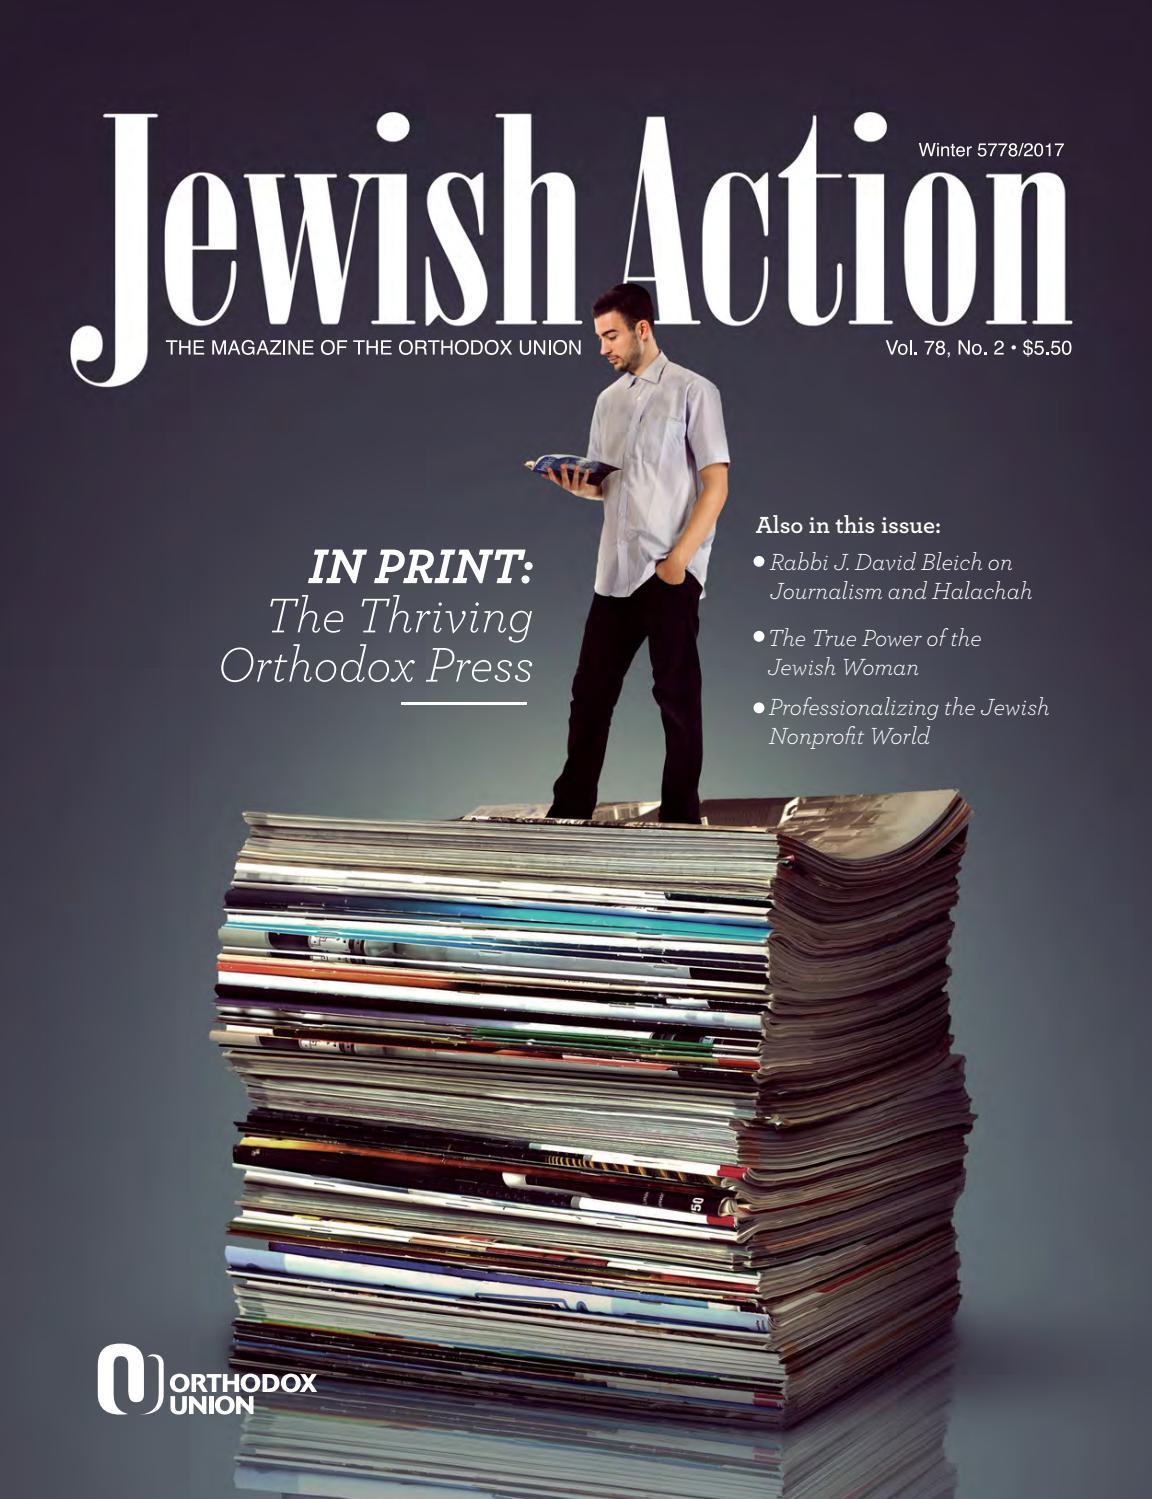 Jewish action winter 2017 by orthodox union issuu izmirmasajfo